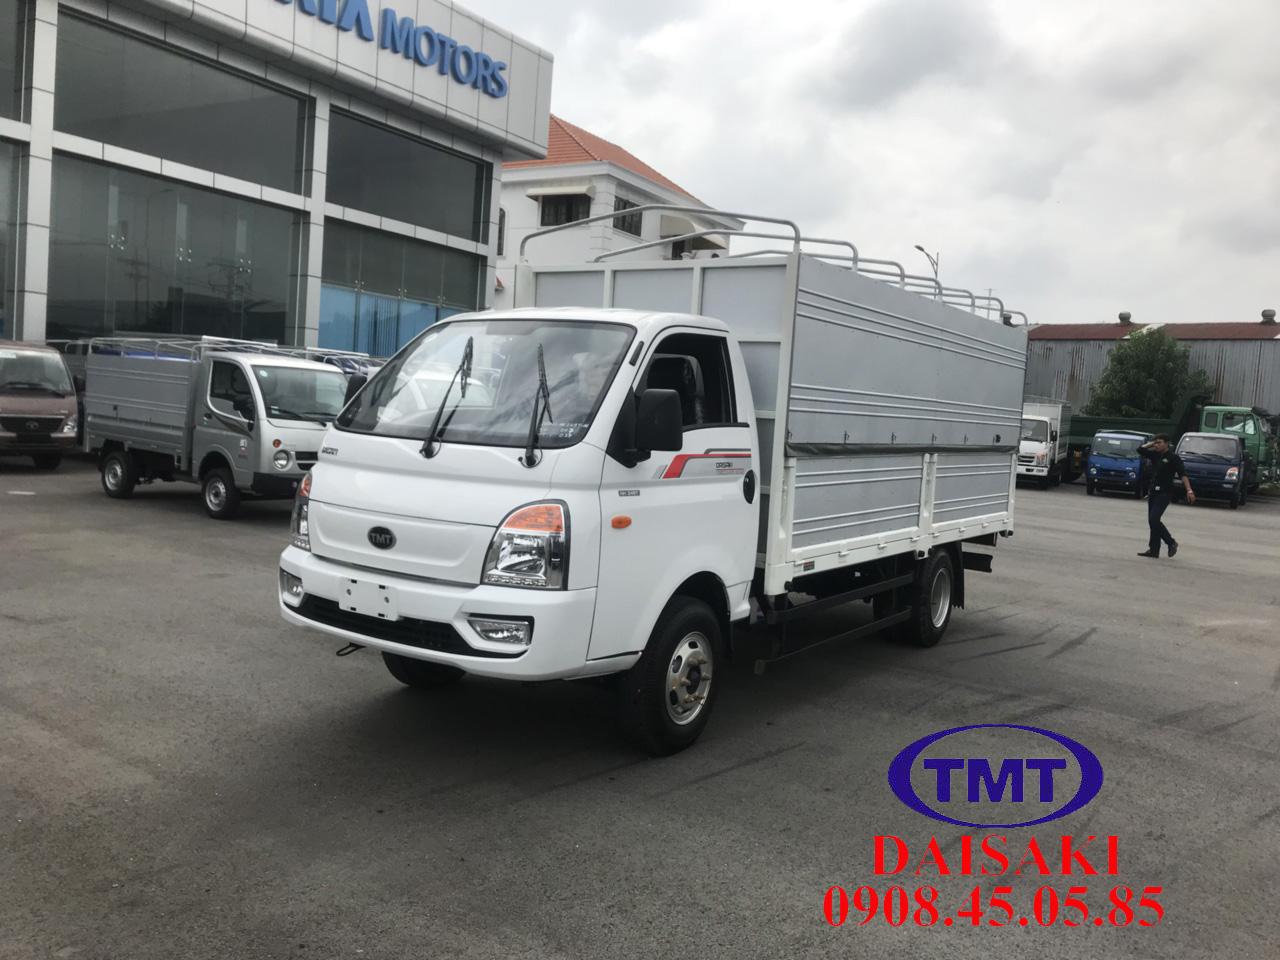 xe tải 2t4 daisaki